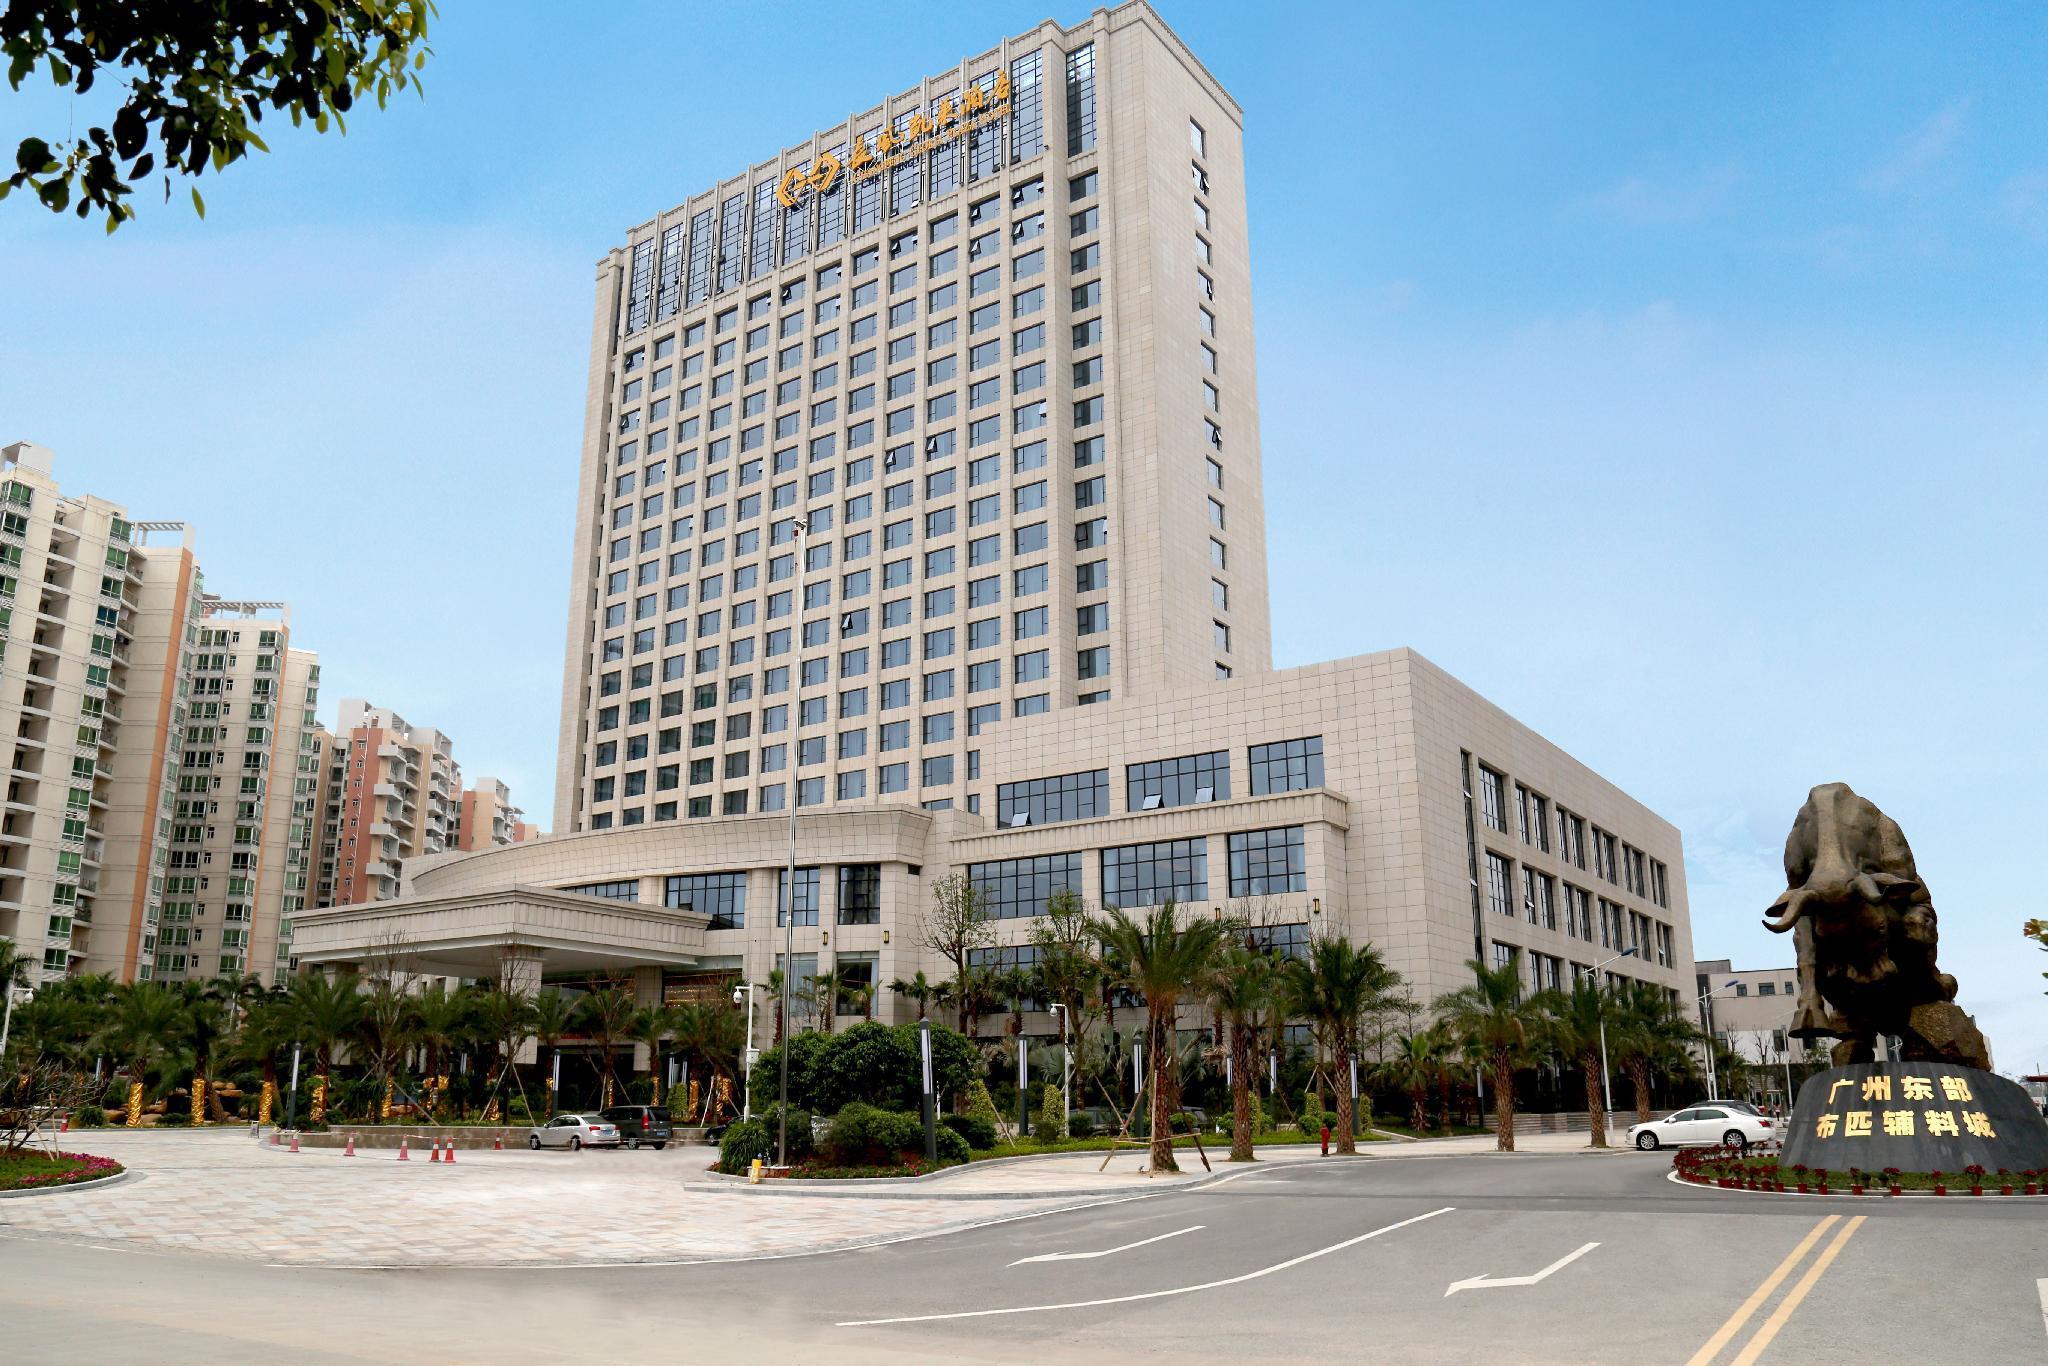 Changfeng Gloria Plaza Hotel